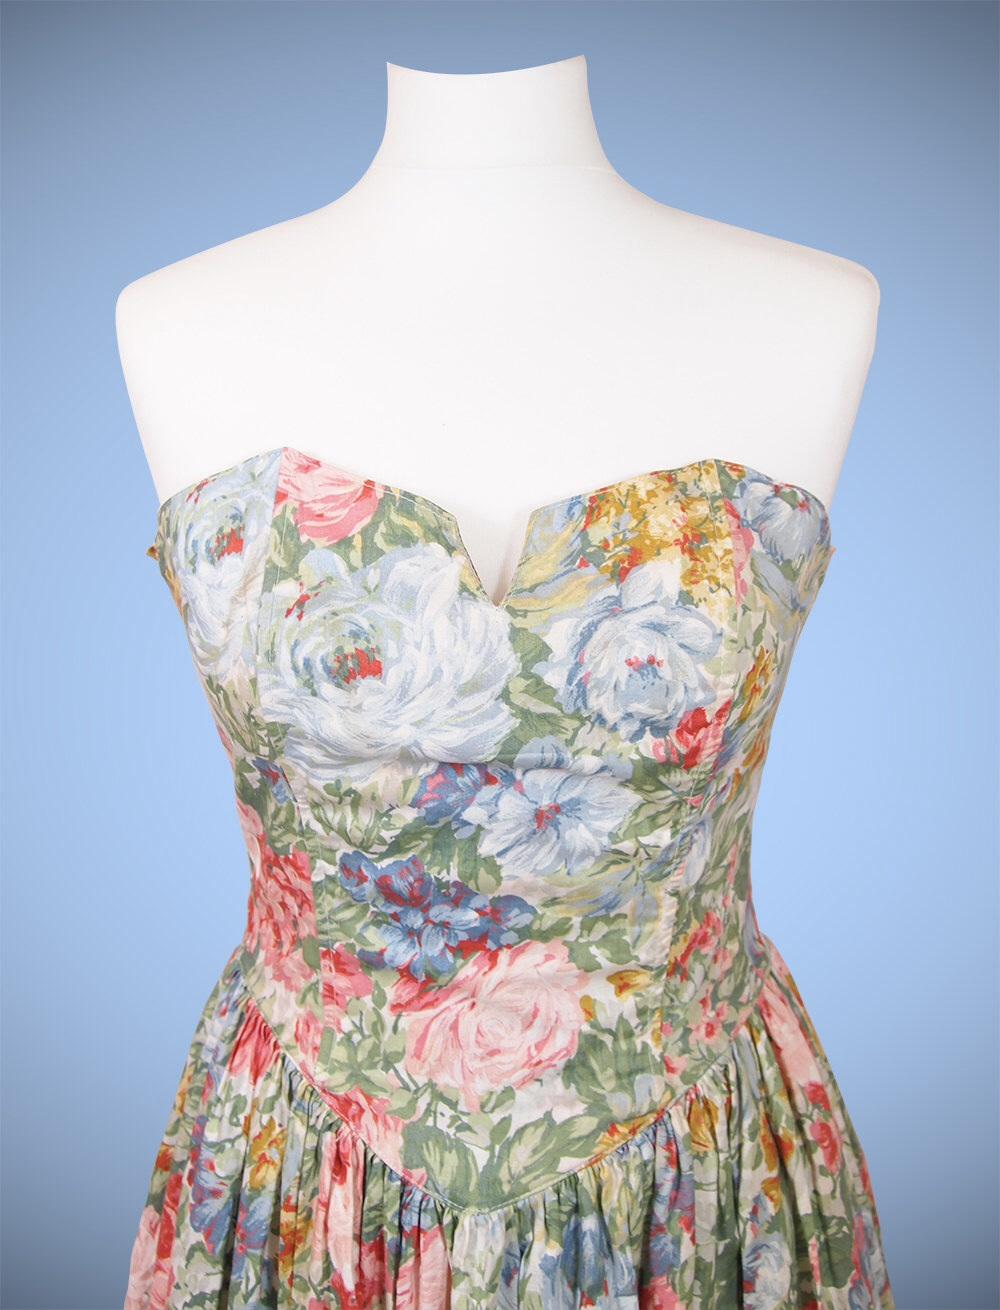 Buy Vintage Clothes Online